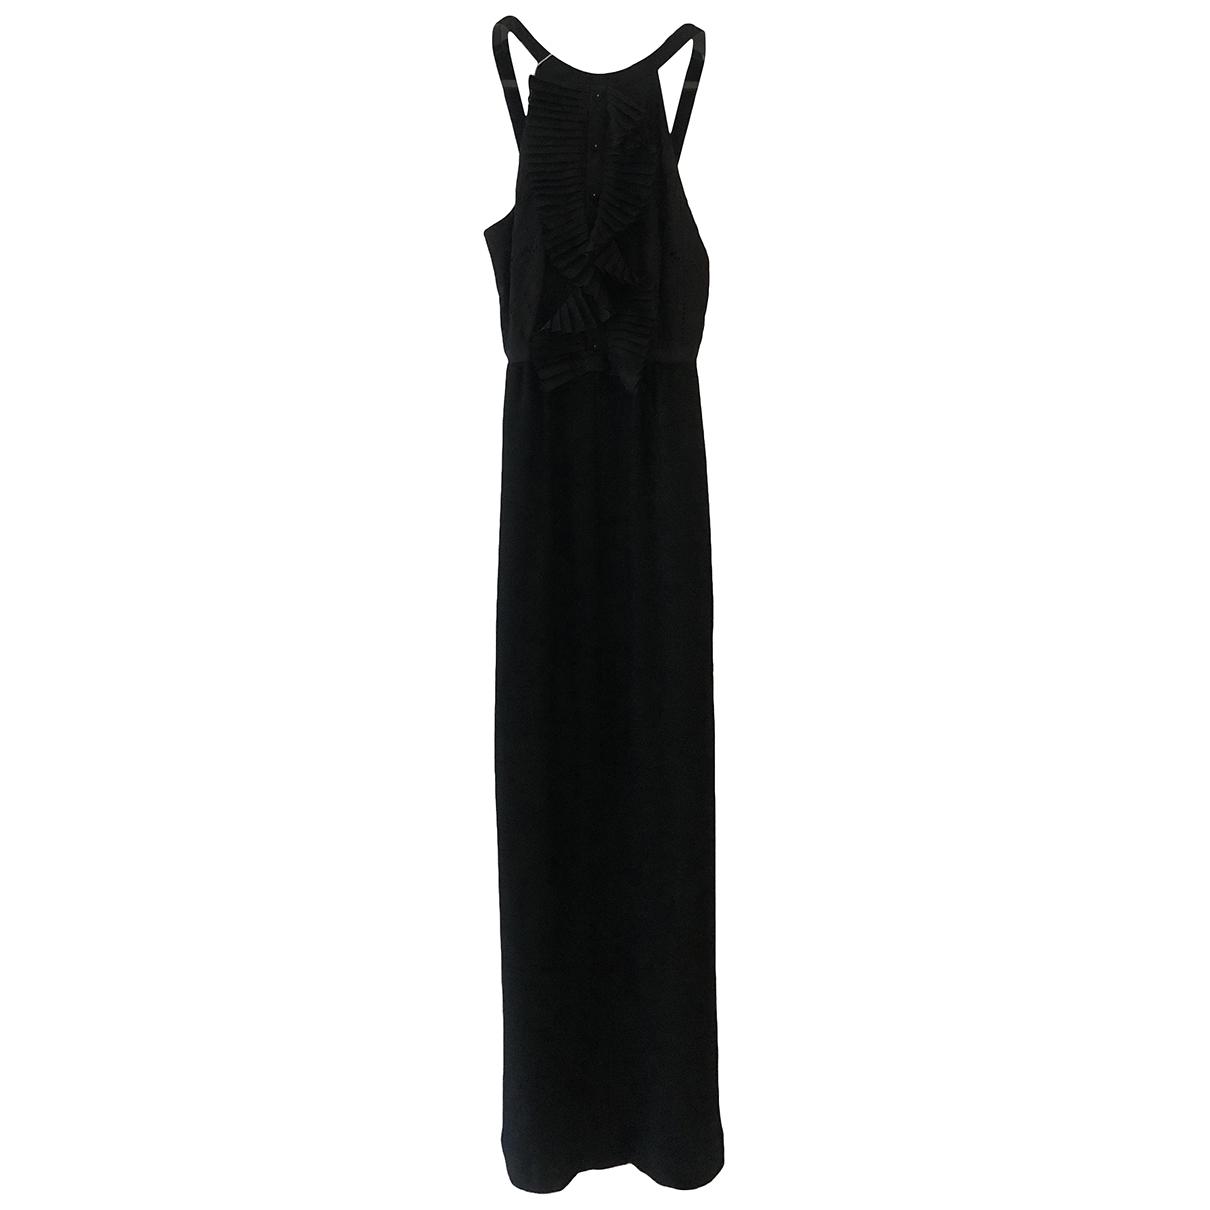 Fendi \N Kleid in  Schwarz Baumwolle